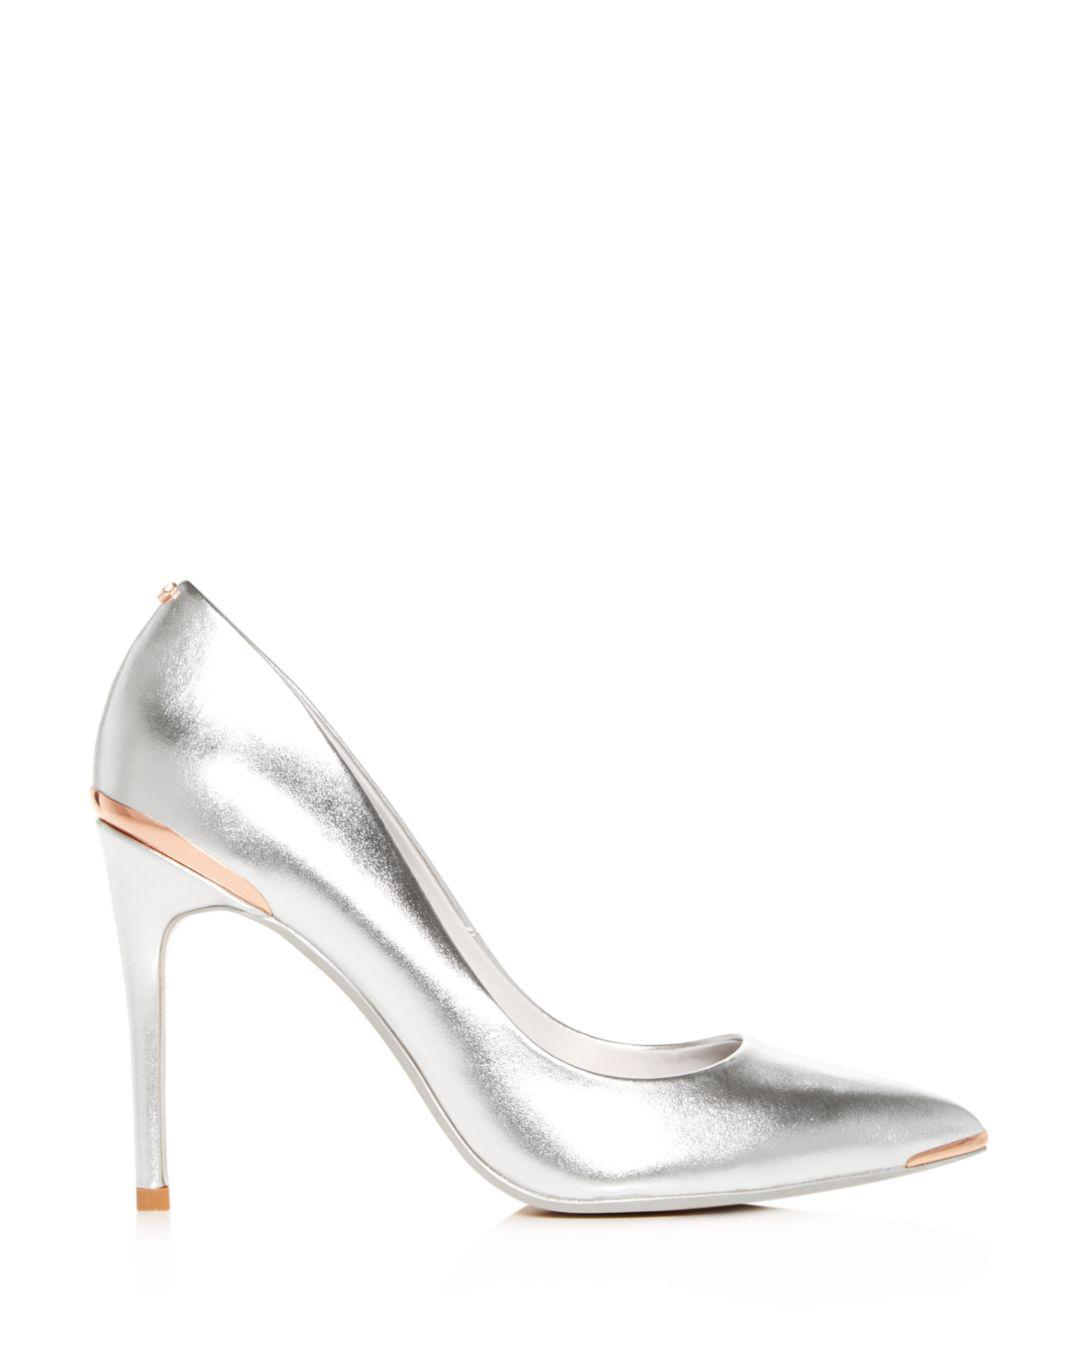 121a98e390682 Lyst - Ted Baker Women s Izibel Pointed-toe Pumps in Metallic